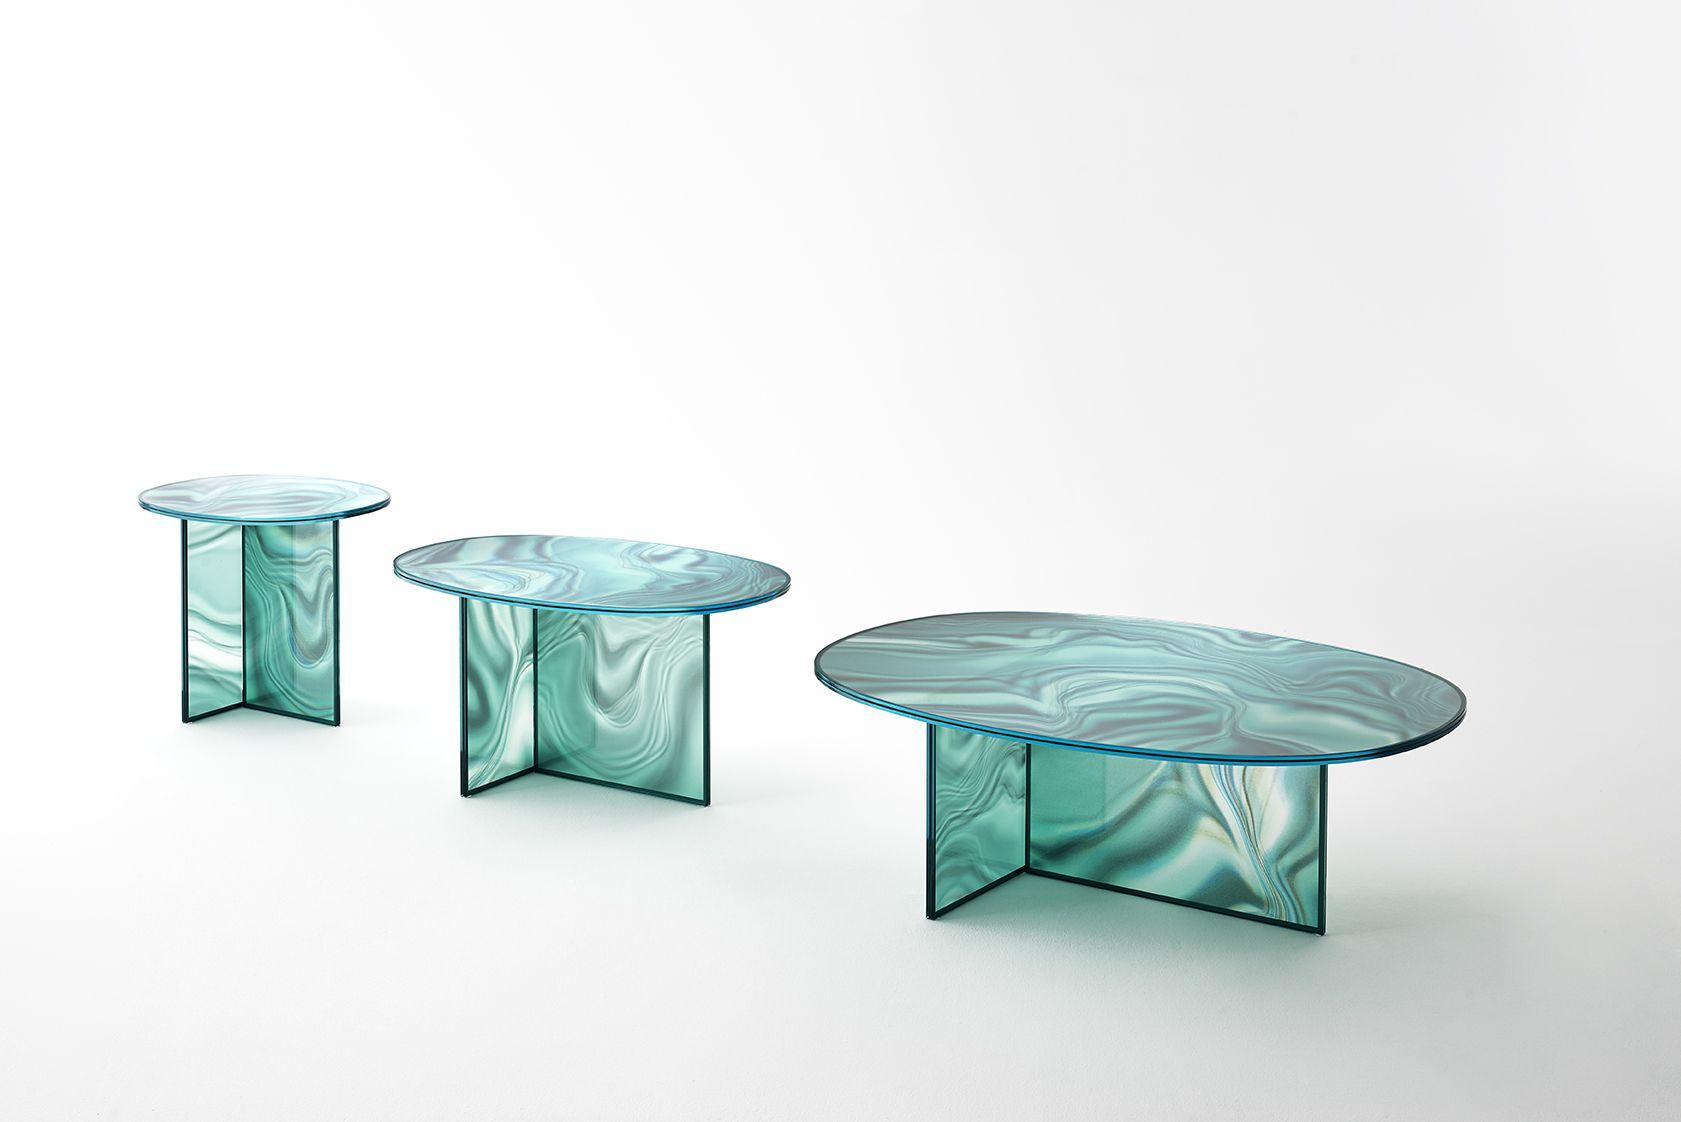 Liquefy Design Patricia Urquiola Glas Italia 2017 Collection